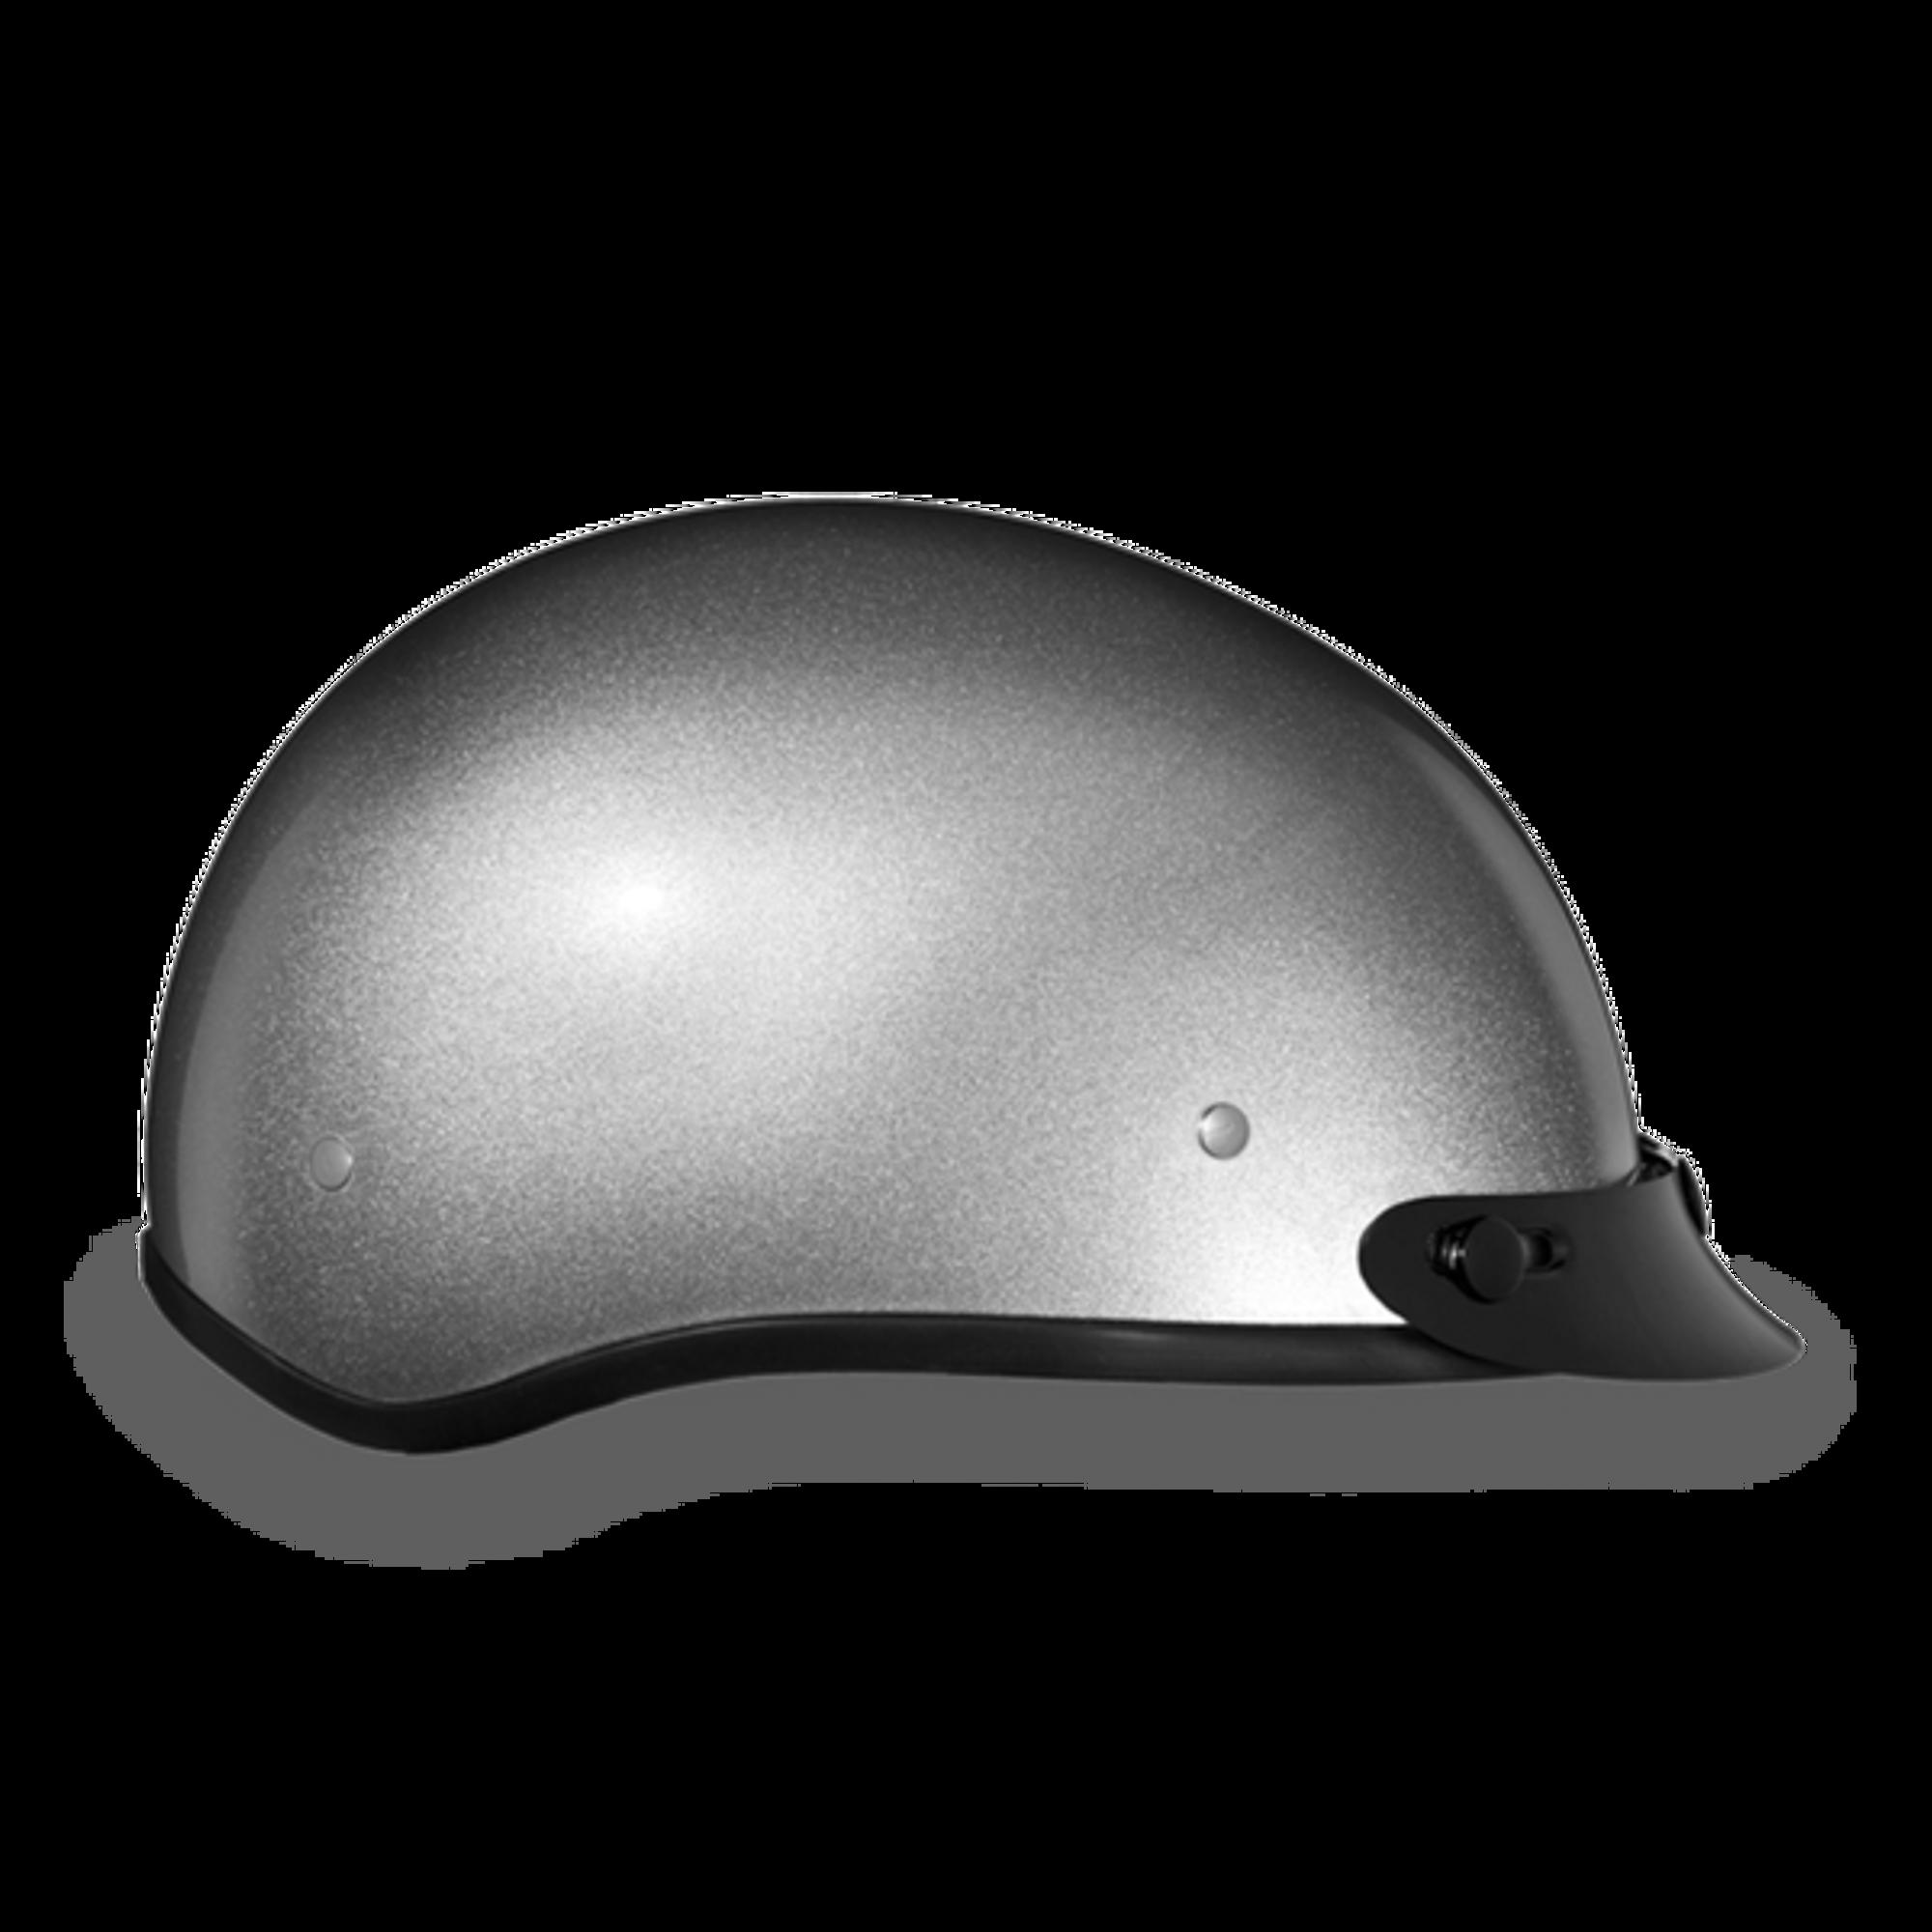 4720534c873 D.O.T. DAYTONA SKULL CAP- SILVER METALLIC - Novelty Helmet Shop